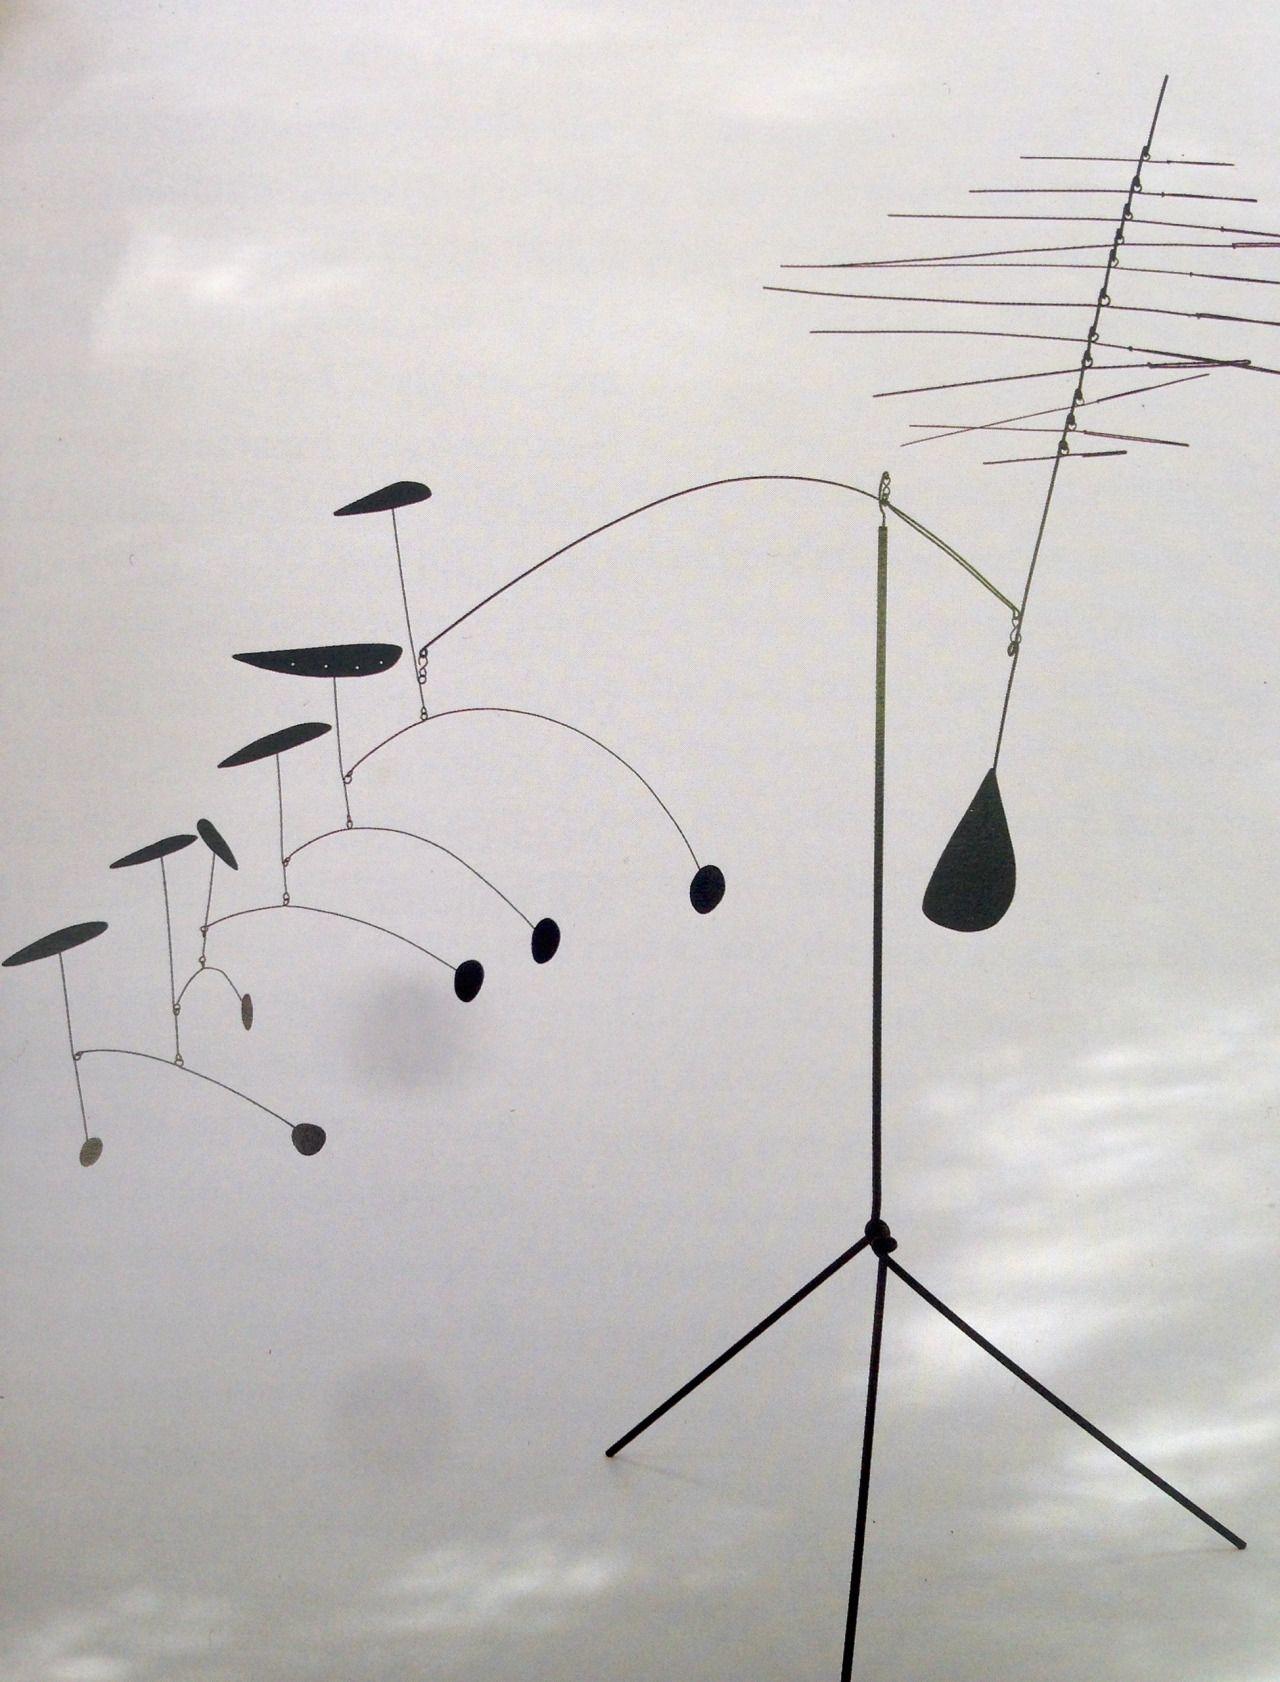 Horizontal Spines A 1942 Sculpture By Alexander Calder Addison